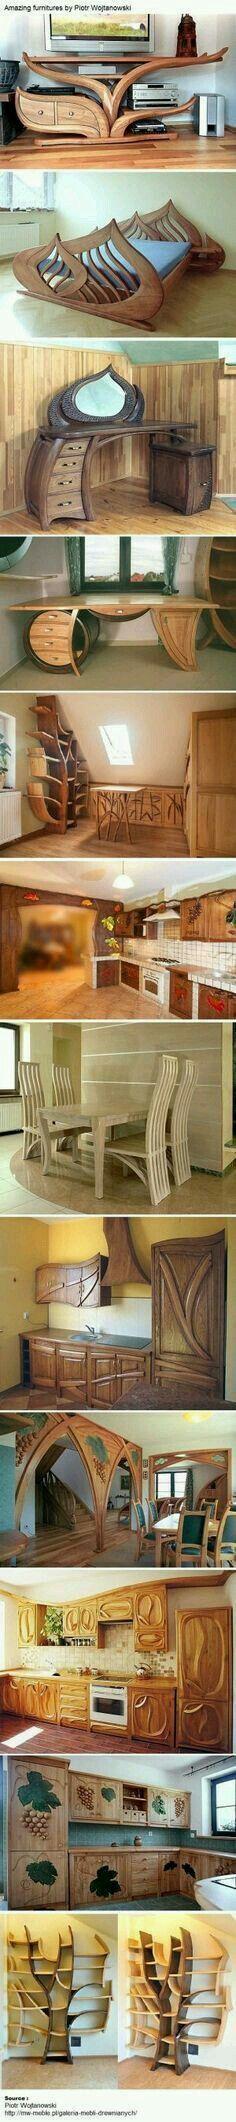 Camas en madera modernas | camas | Pinterest | Camas, Moderno y Madera